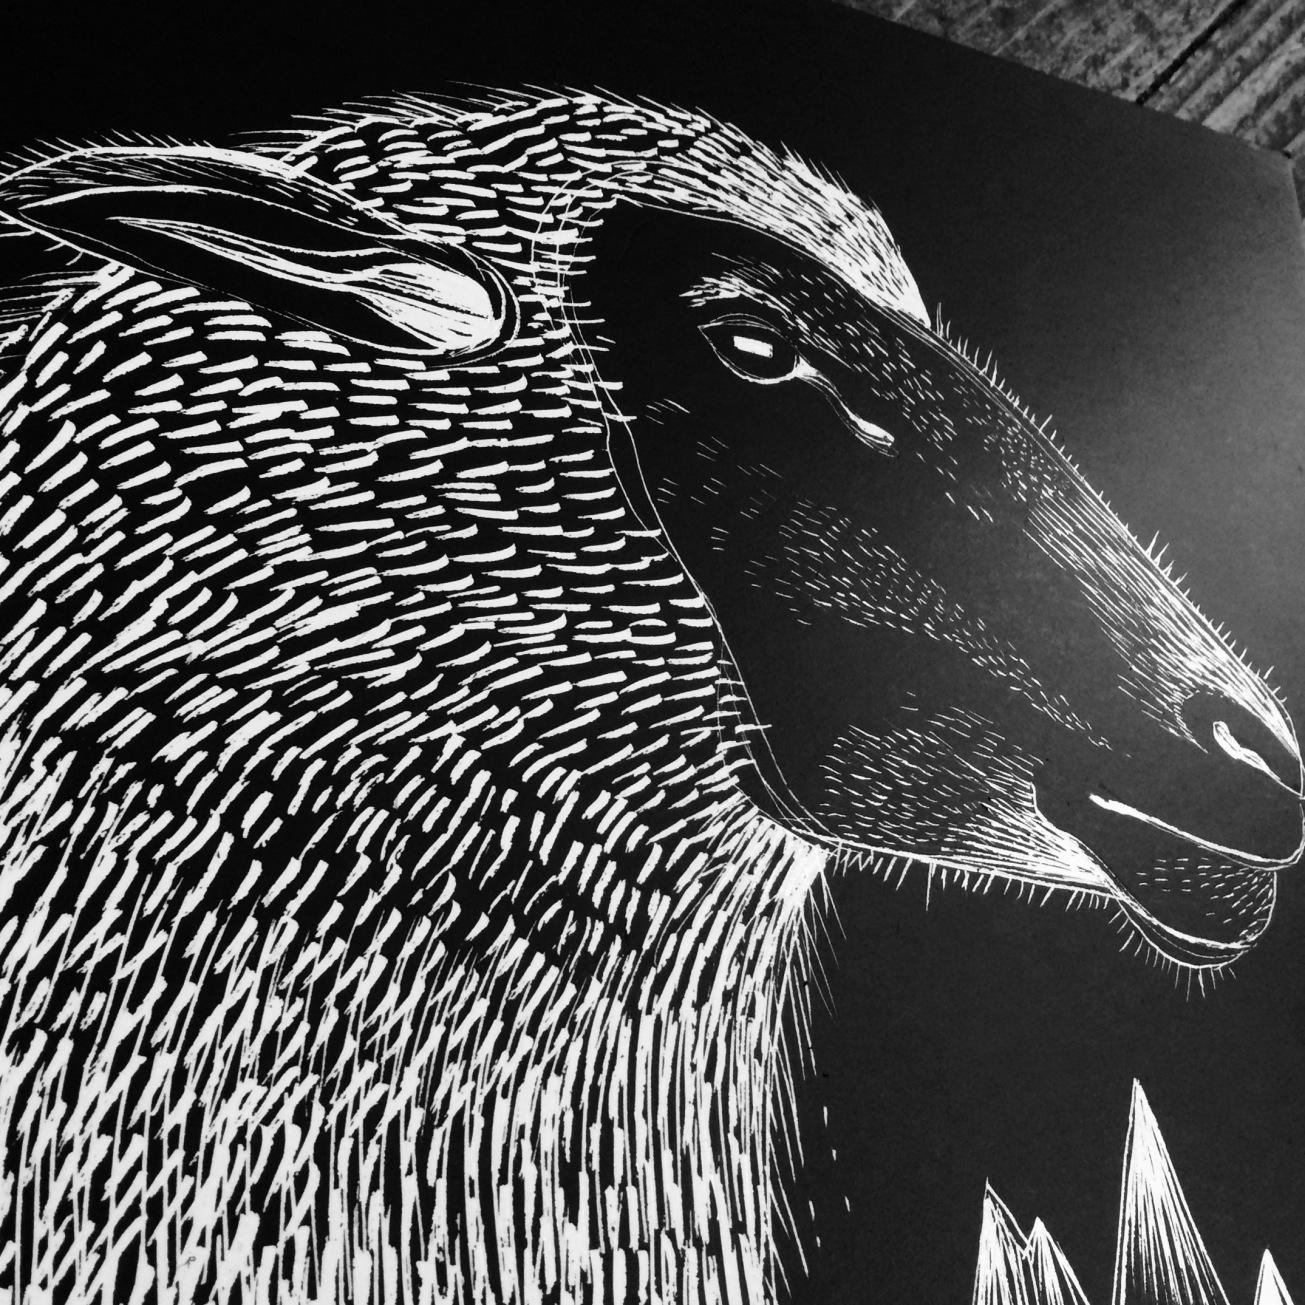 Miriam_Frank_sheep